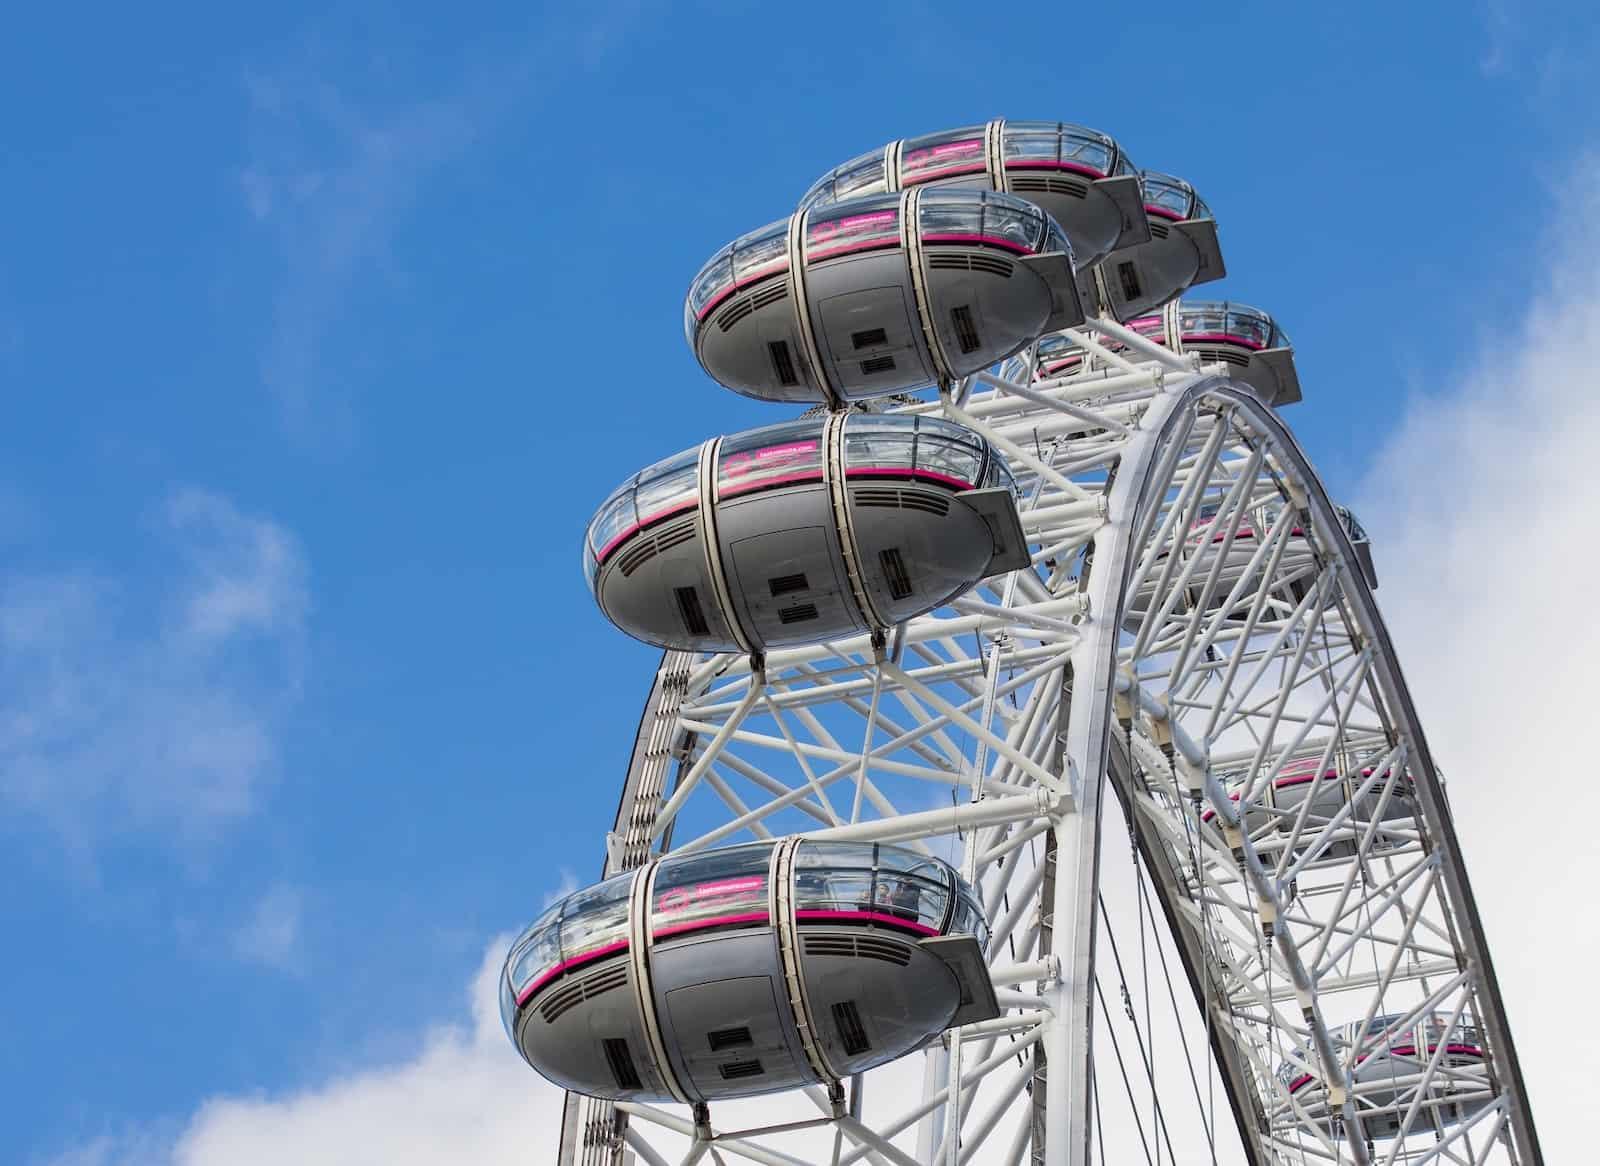 London Eye lastminute.com